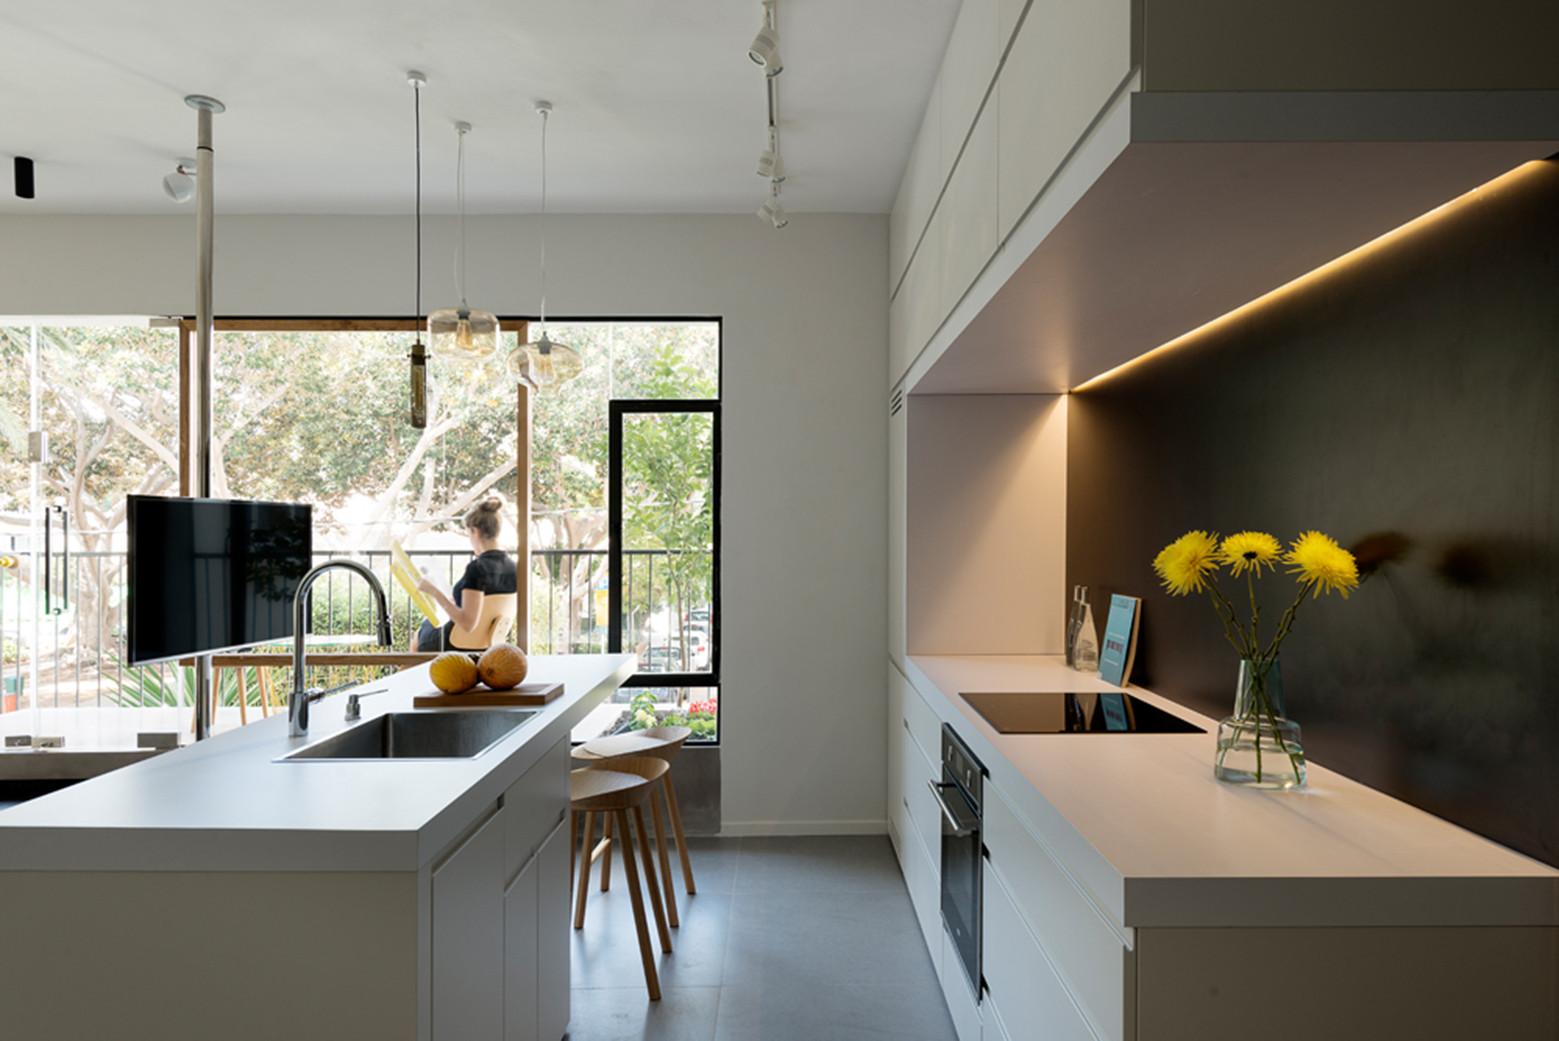 gallery of apartment in tel aviv amir navon studio 6b. Black Bedroom Furniture Sets. Home Design Ideas